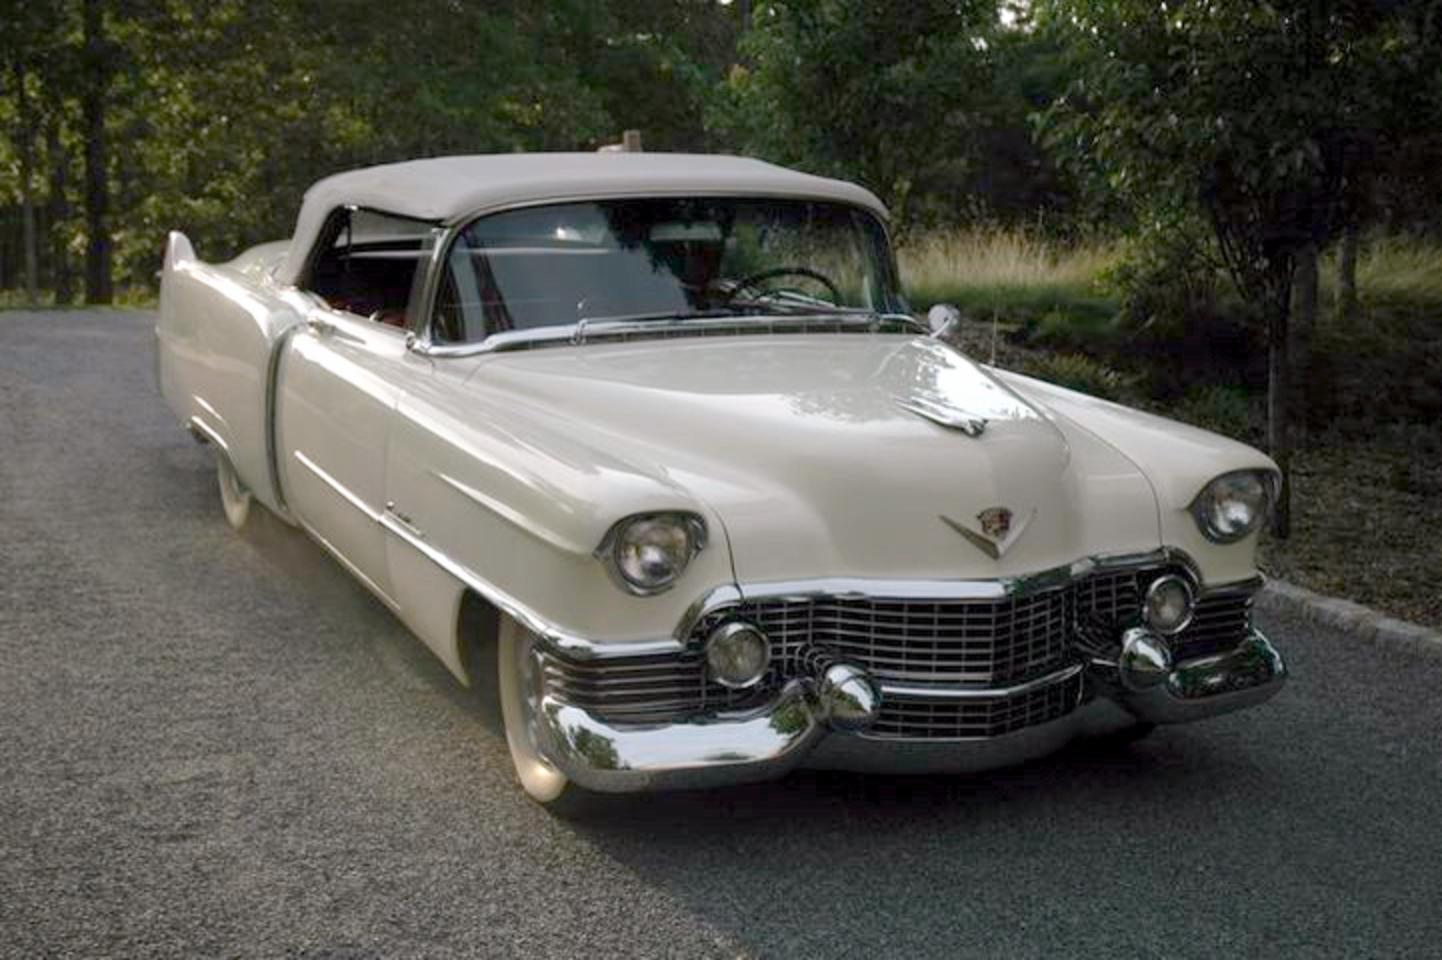 Topworldauto Photos Of Cadillac Series 62 Convertible Photo 1951 1954 Chassis 546203284